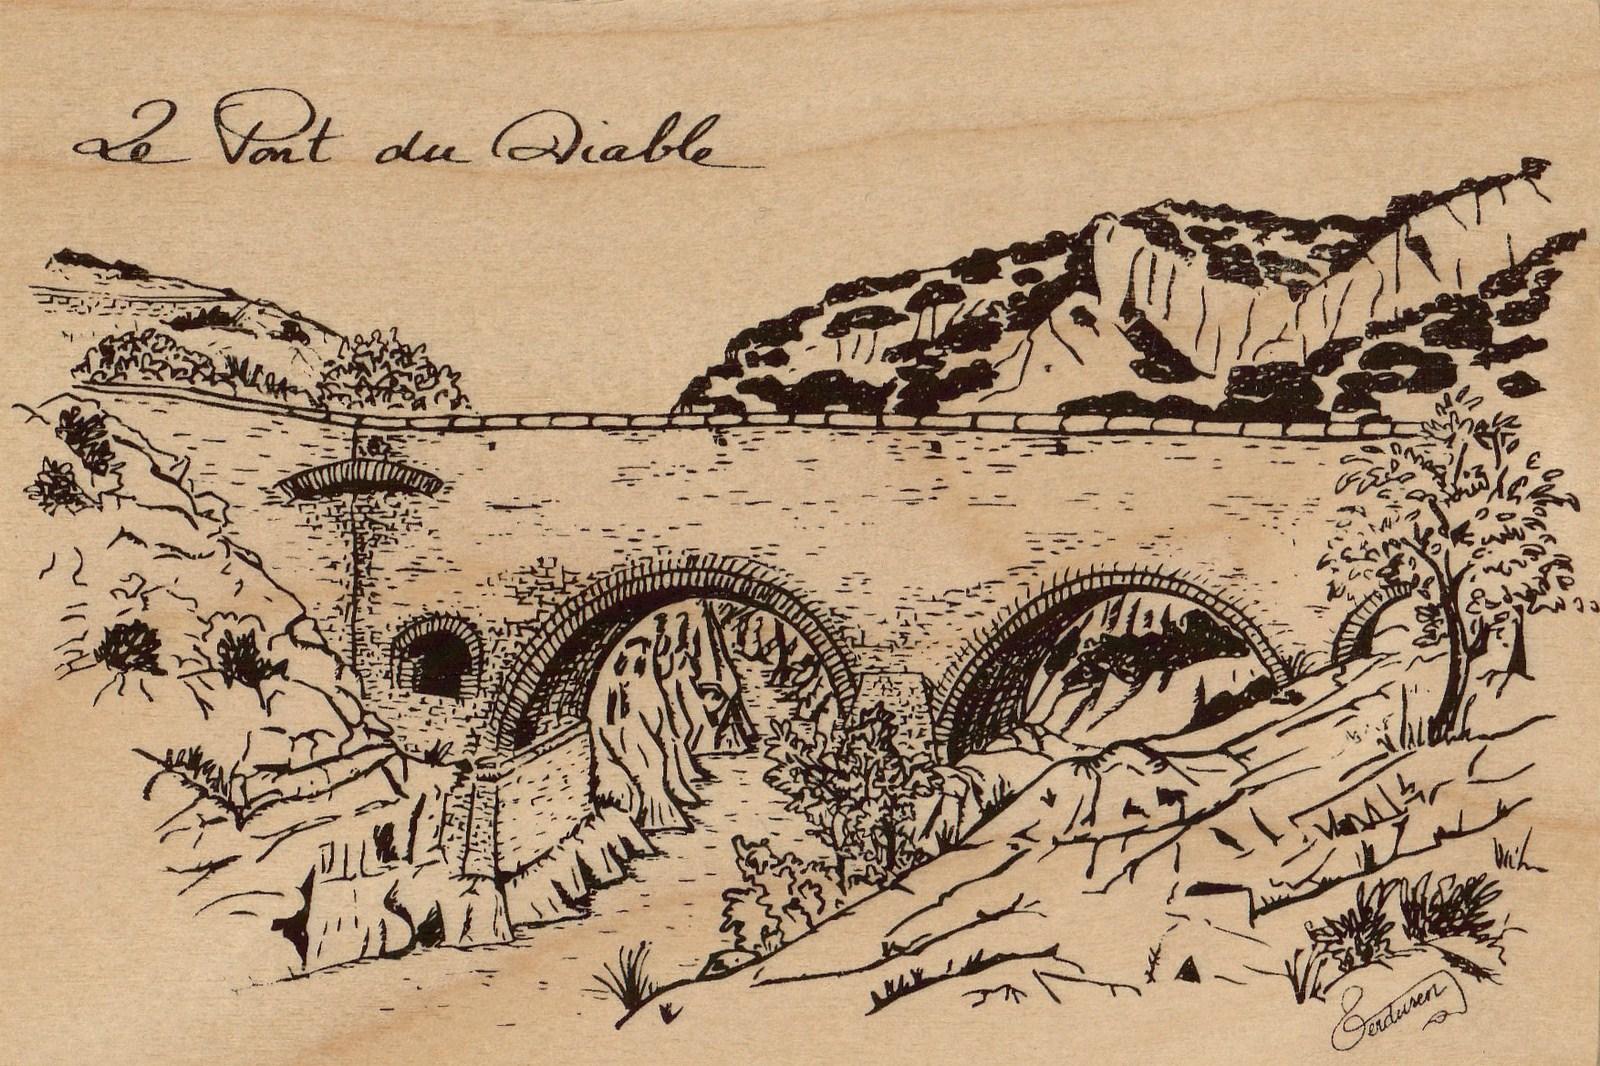 carte postale en bois-pont du diable-micropanorama